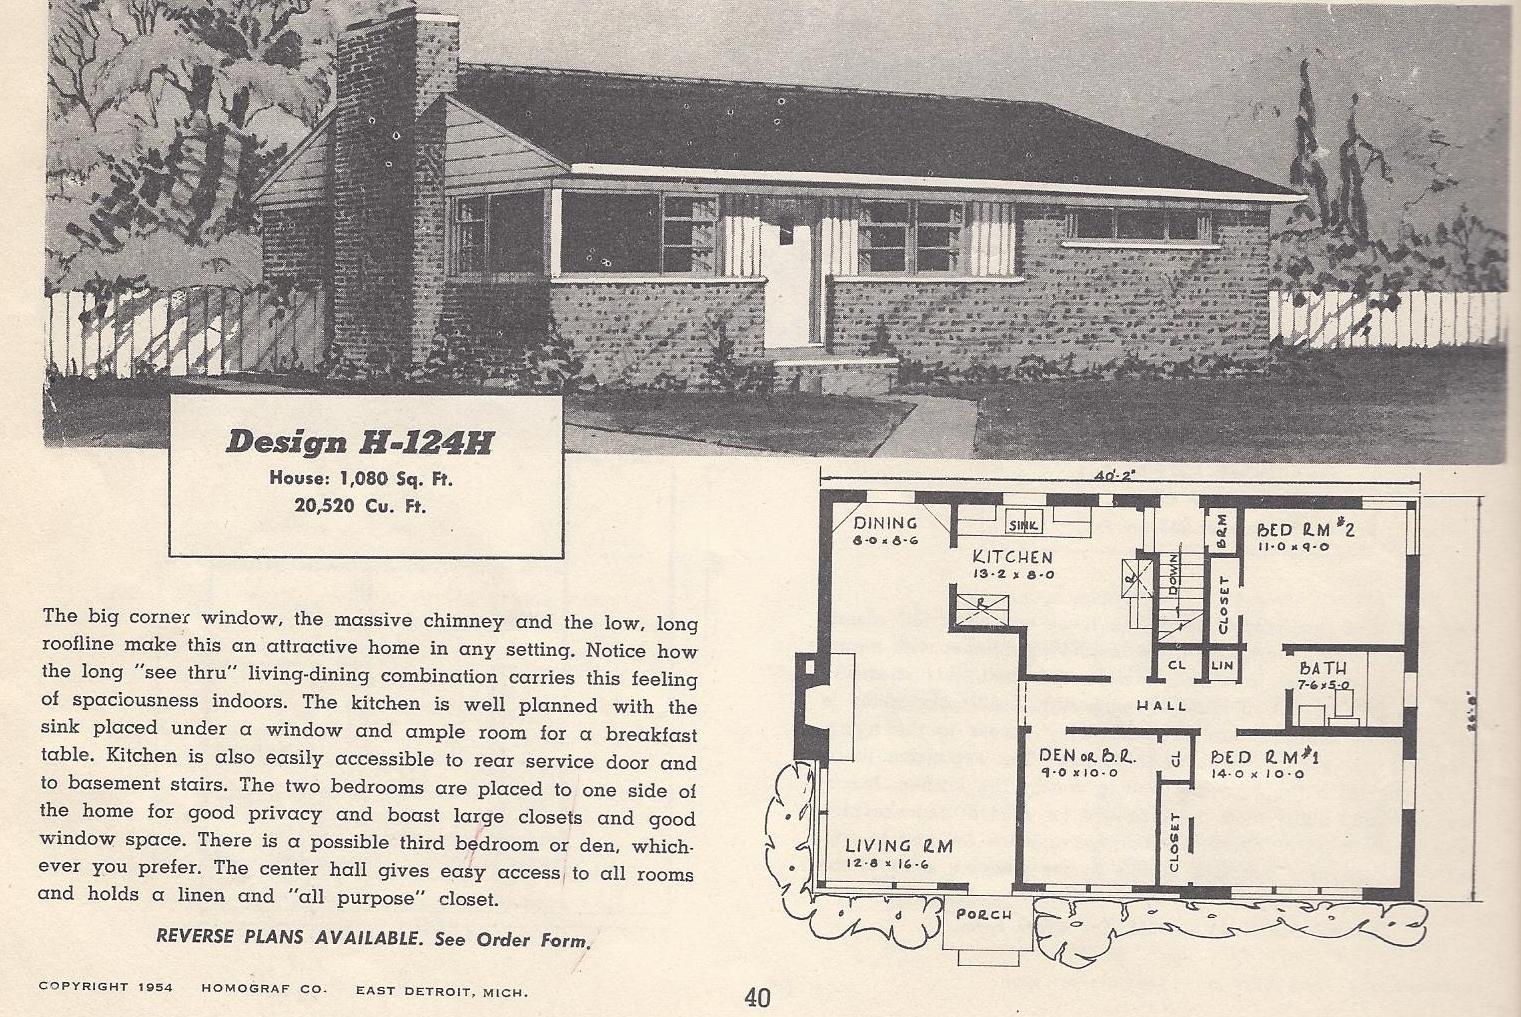 Vintage house plans 124h antique alter ego for Antique house plans